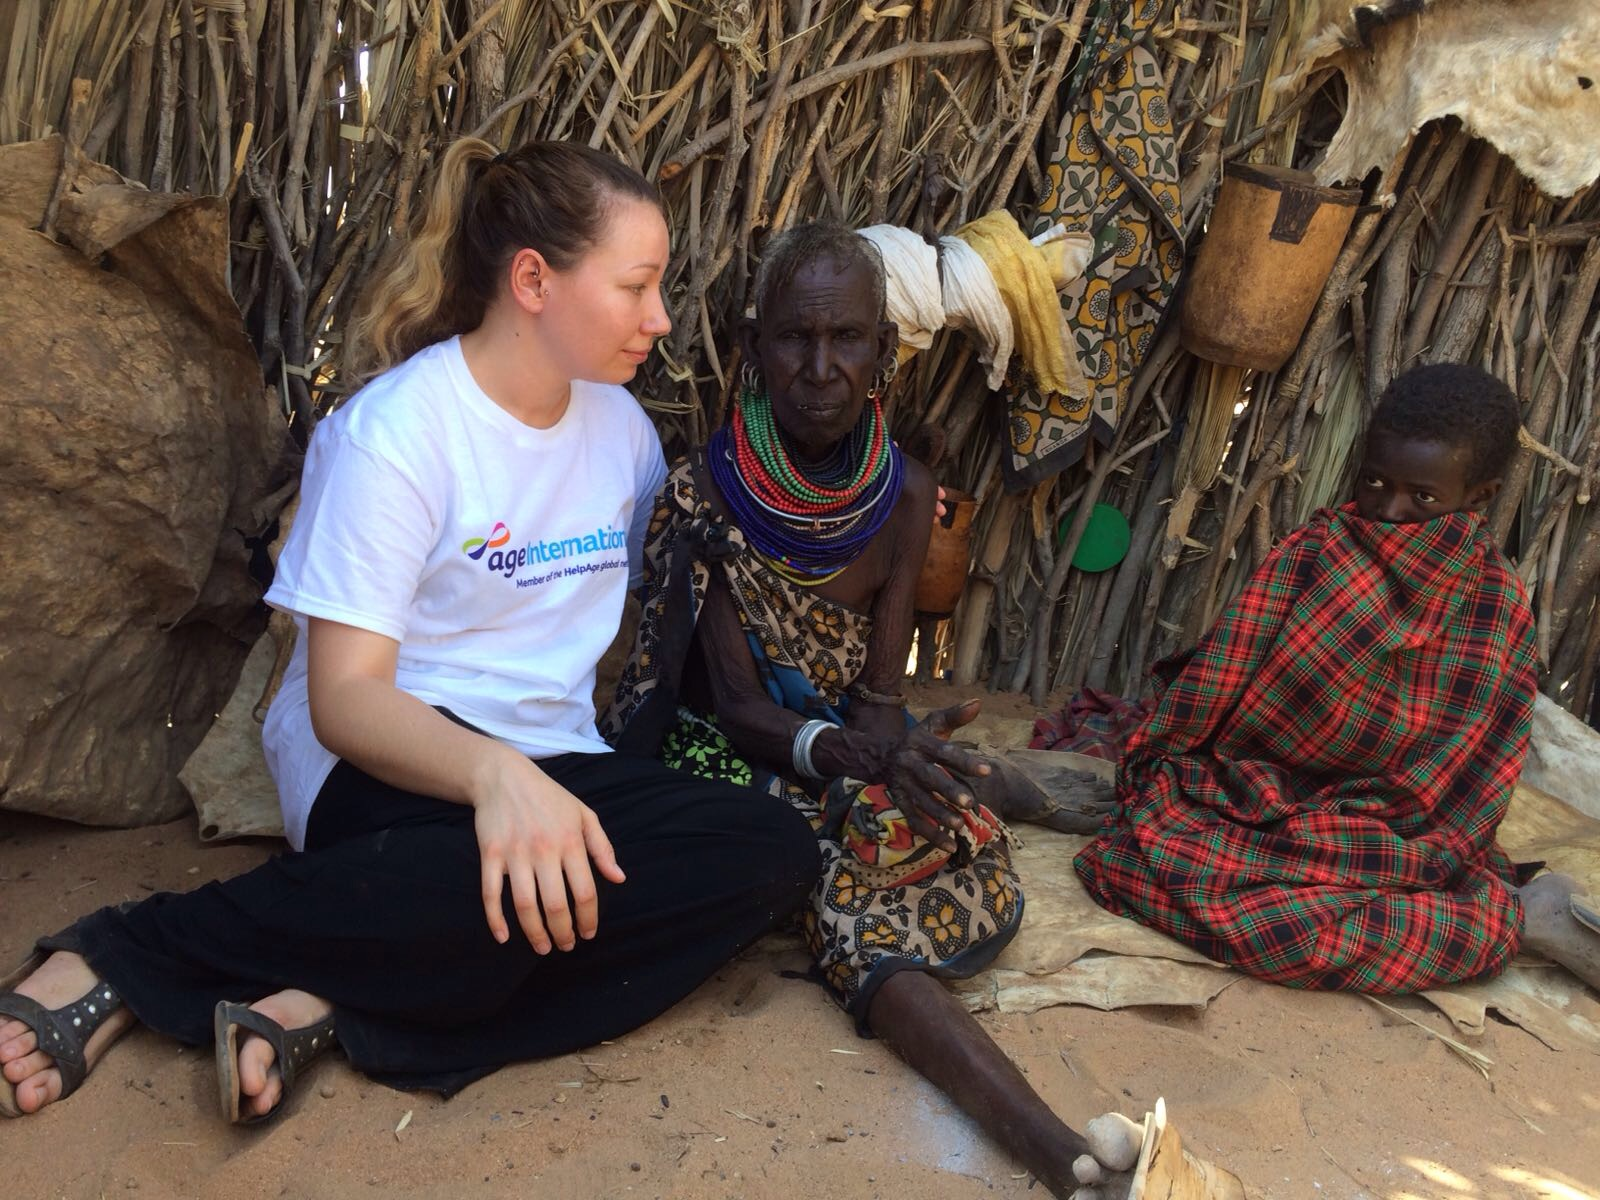 Age International meets older people in Kenya struggling through drought.